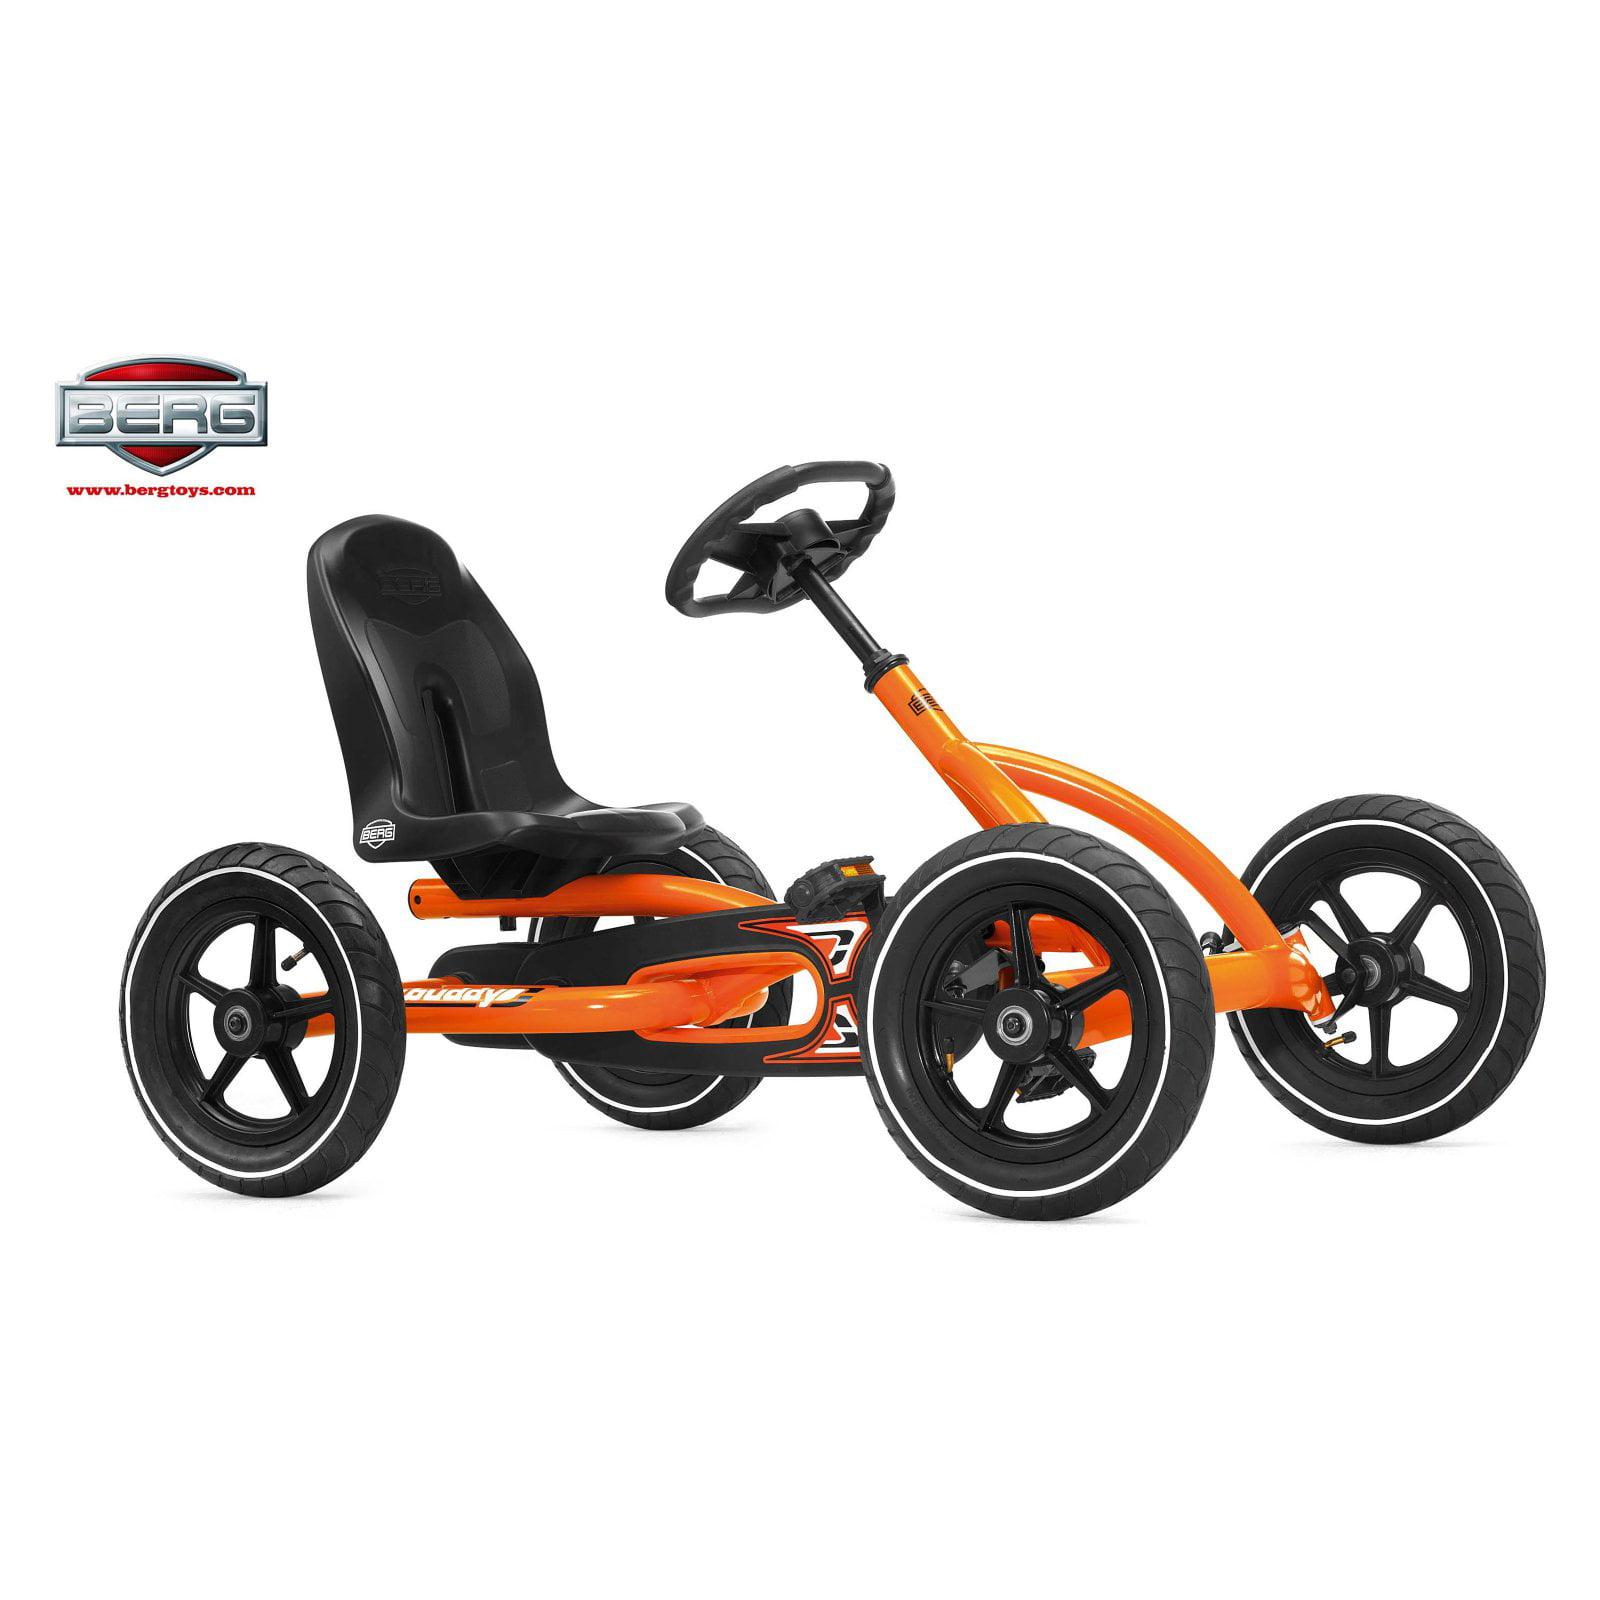 Berg USA Buddy Pedal Go Kart - Orange